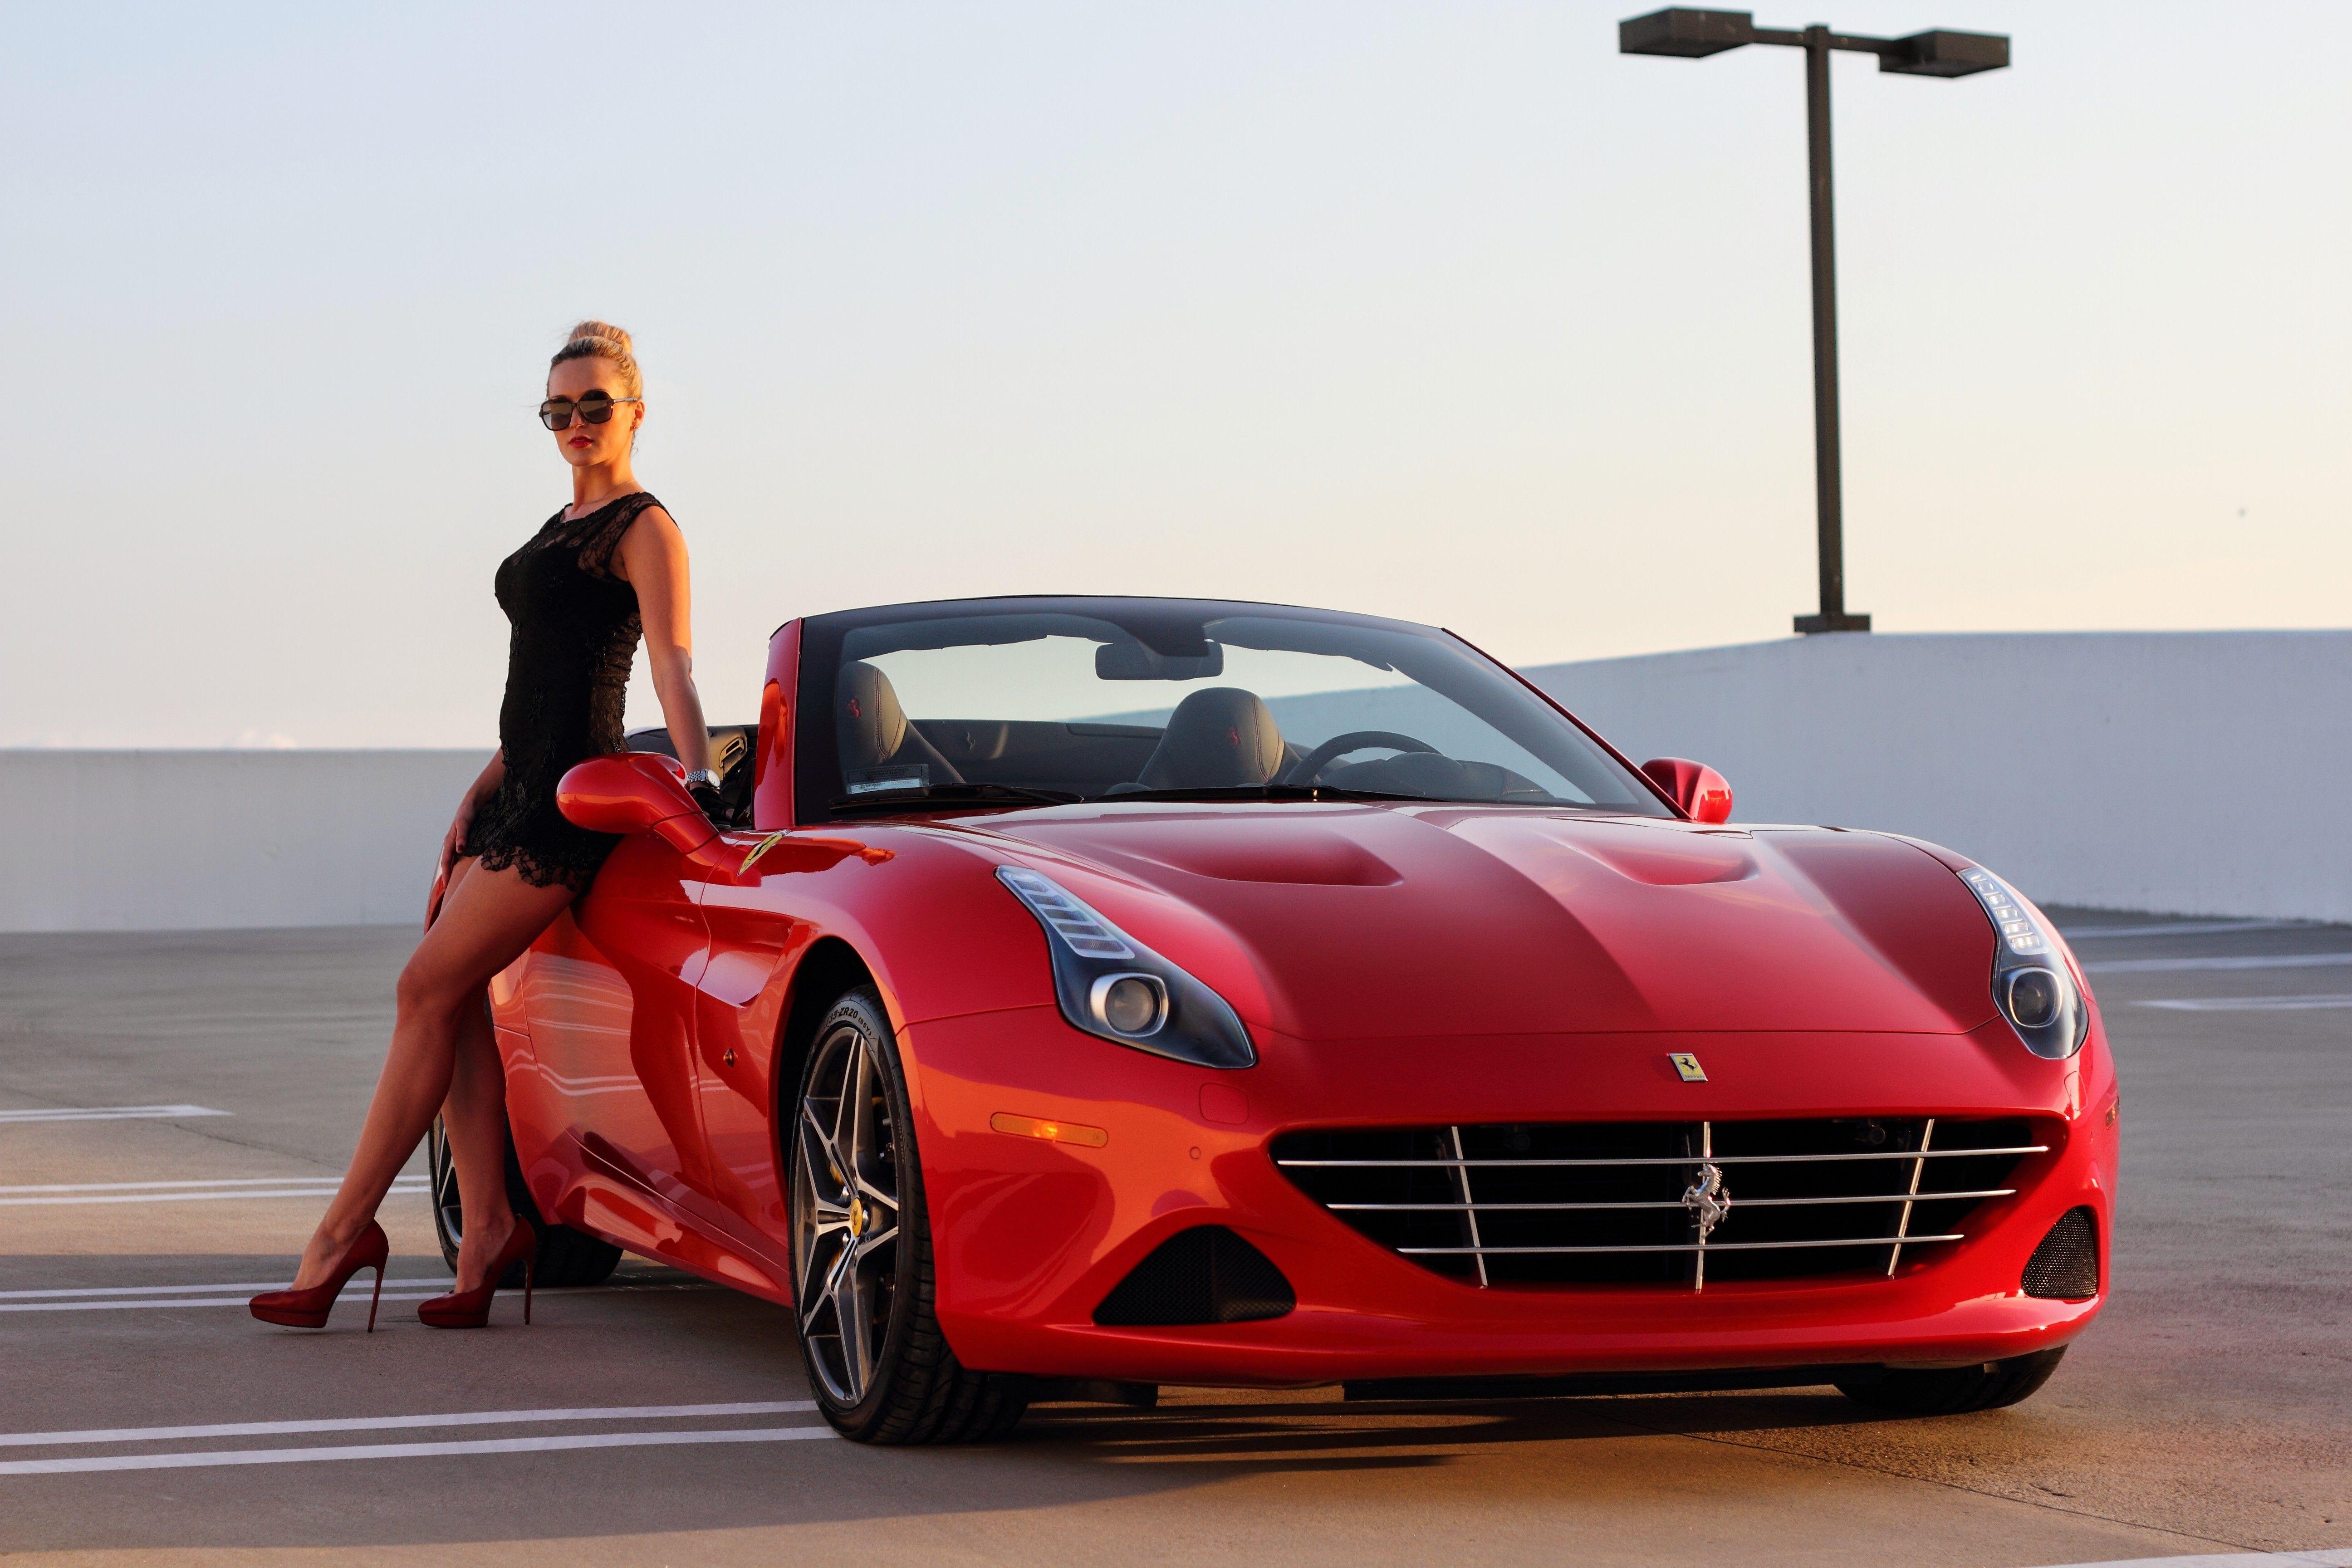 test rent california a day italy for in tour ferrari drive maranello